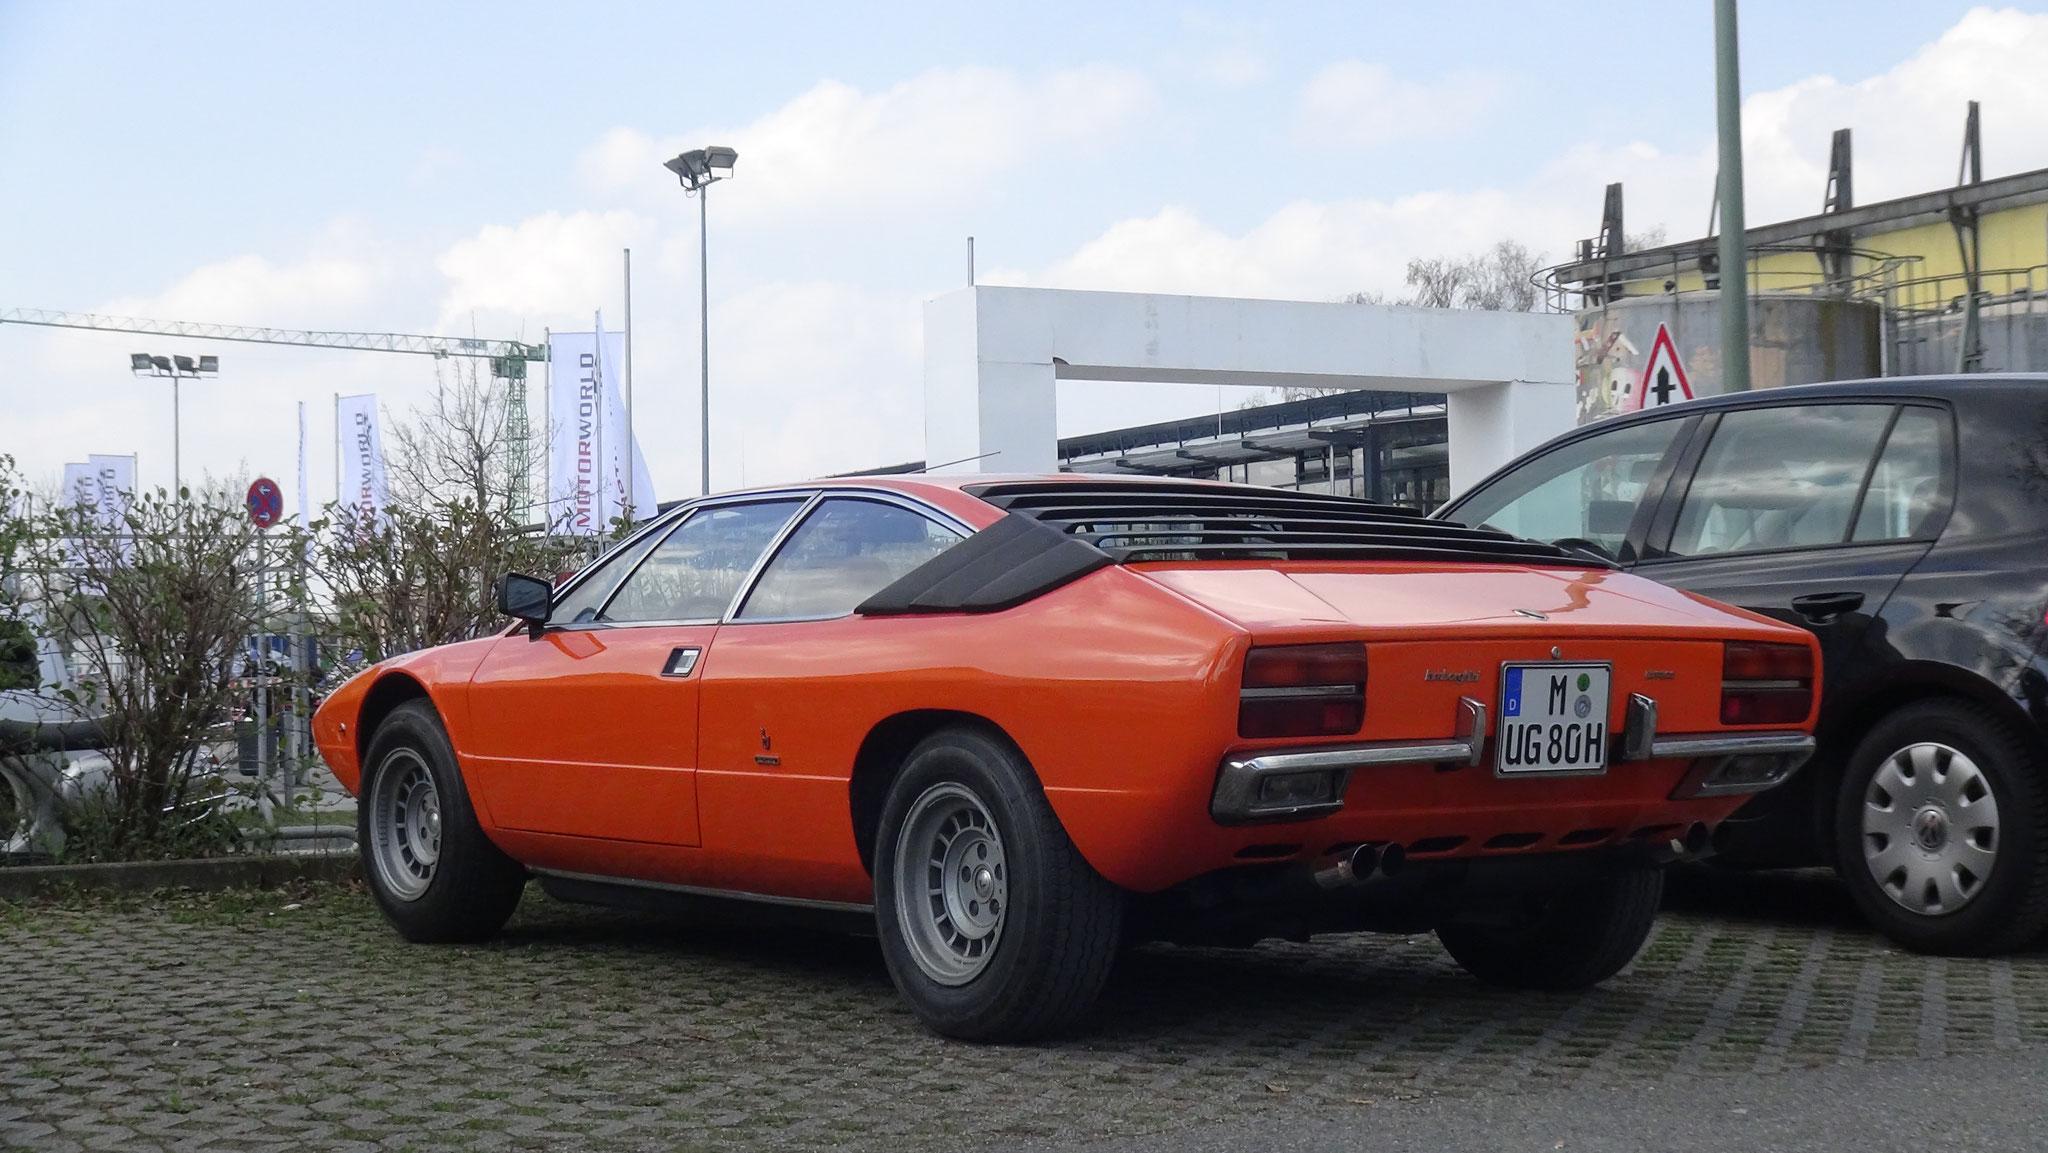 Lamborghini Urraco - M-UG-80H